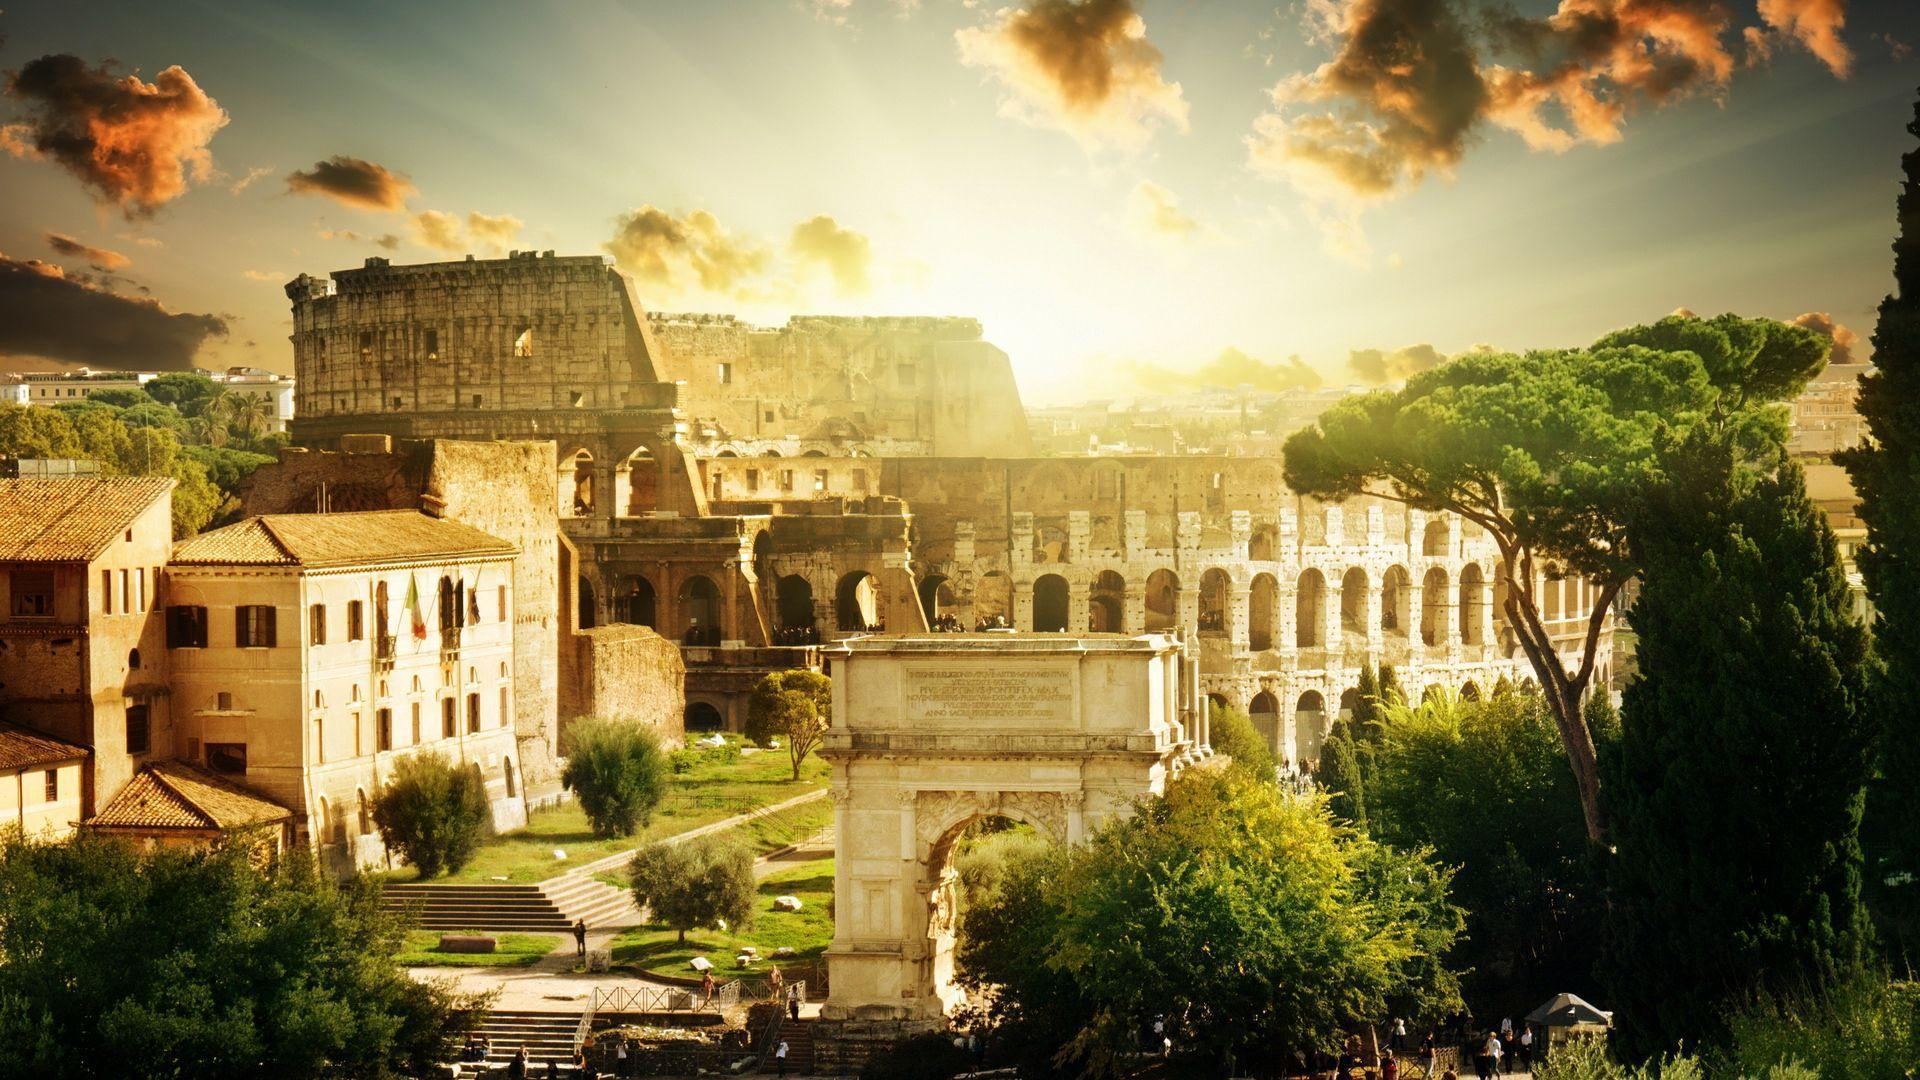 Roma wallpaper | 1920x1080 | 209220 | WallpaperUP